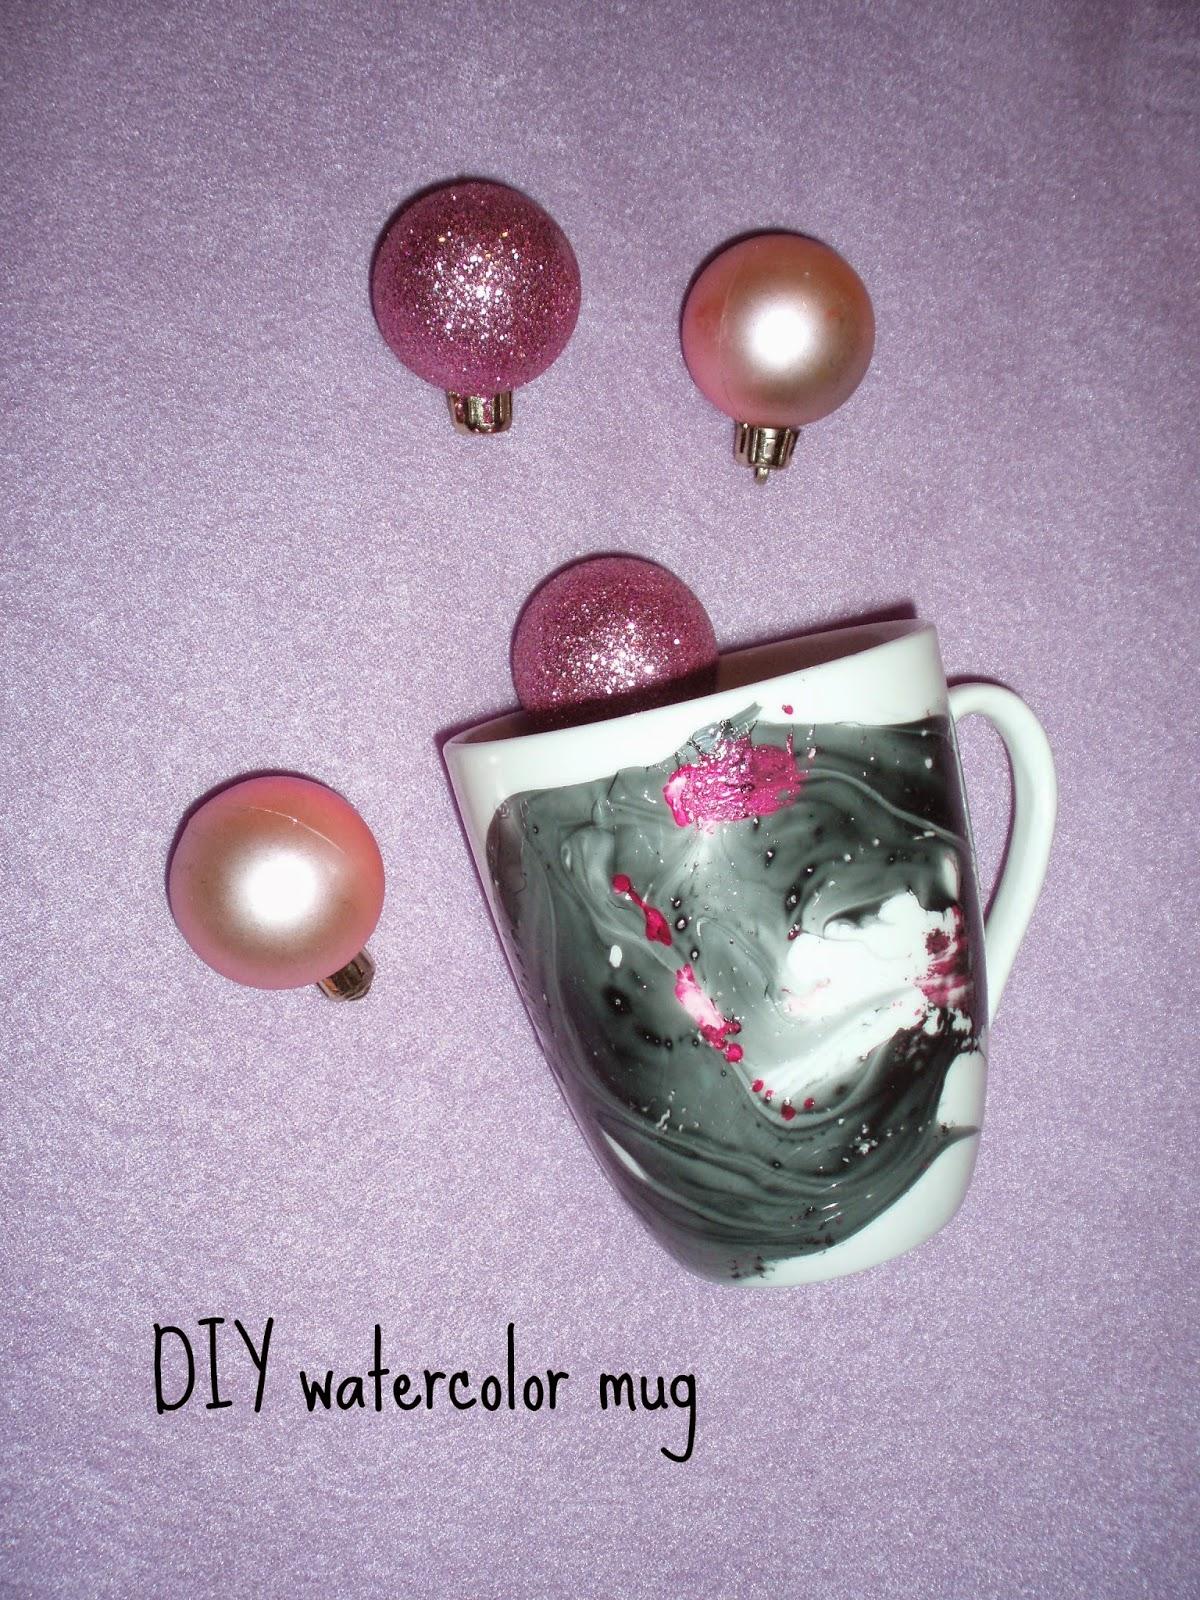 DIY Watercolor Mug κούπα με εφε νερομπογιας